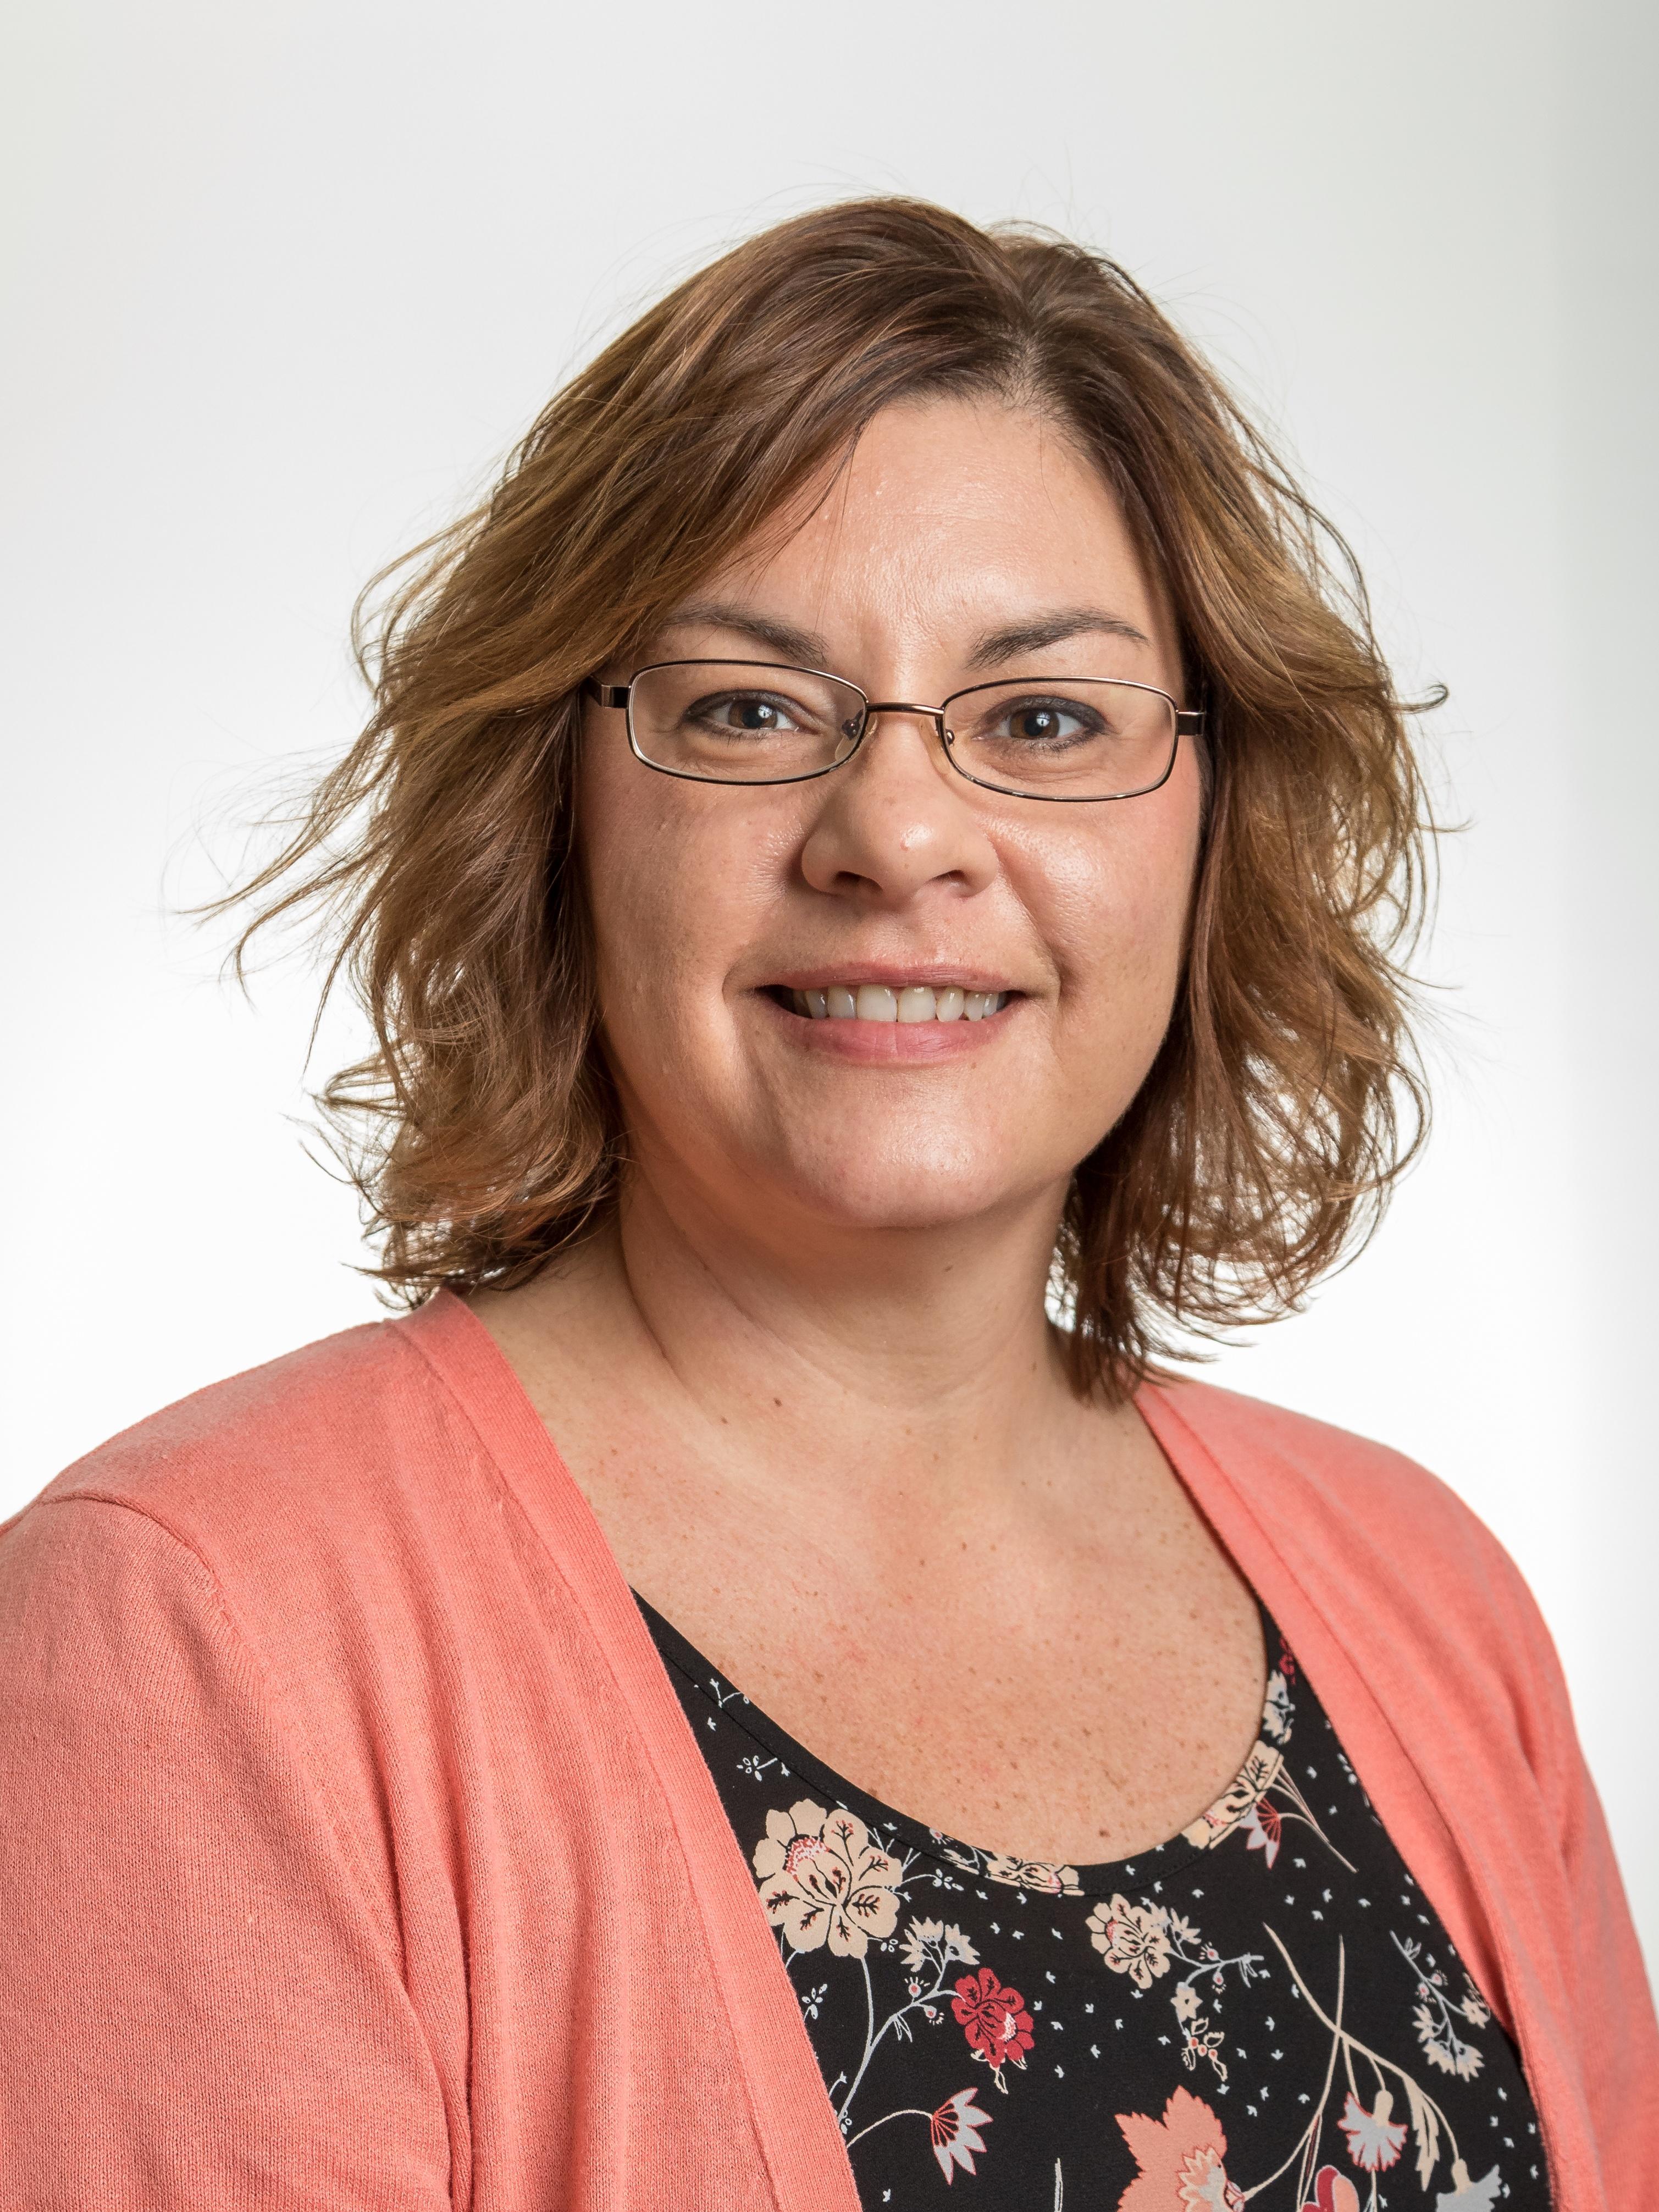 Employee Spotlight: Amy Harvell, CHMM, RPC